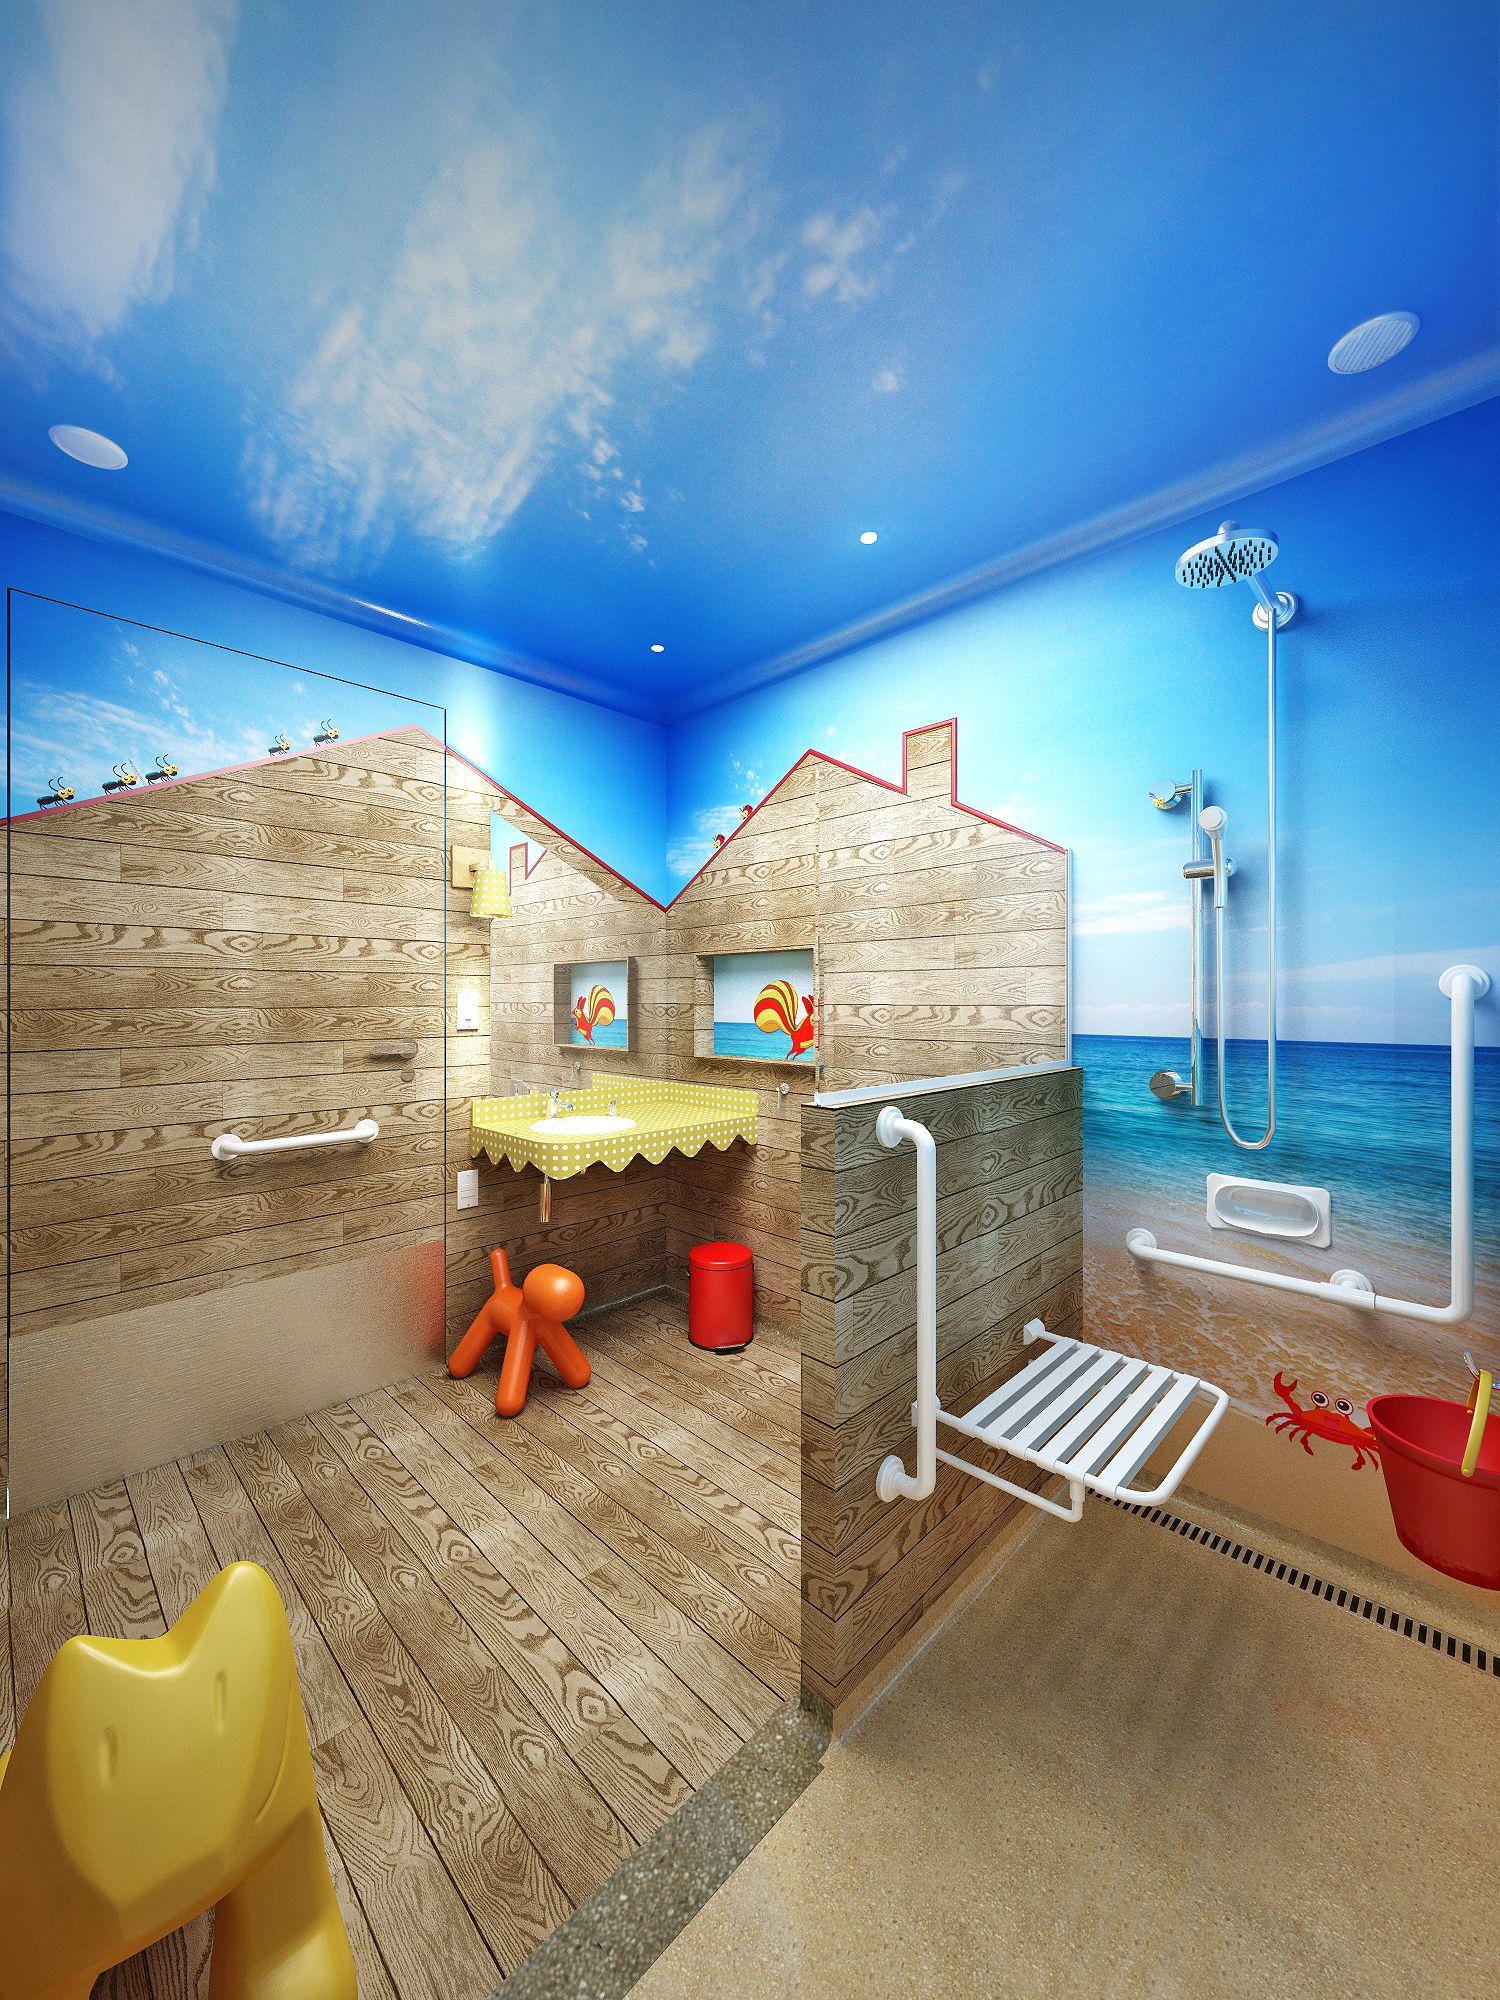 Hospital Bathroom For Children Kid 39 S Room Pinterest Interiors And Room